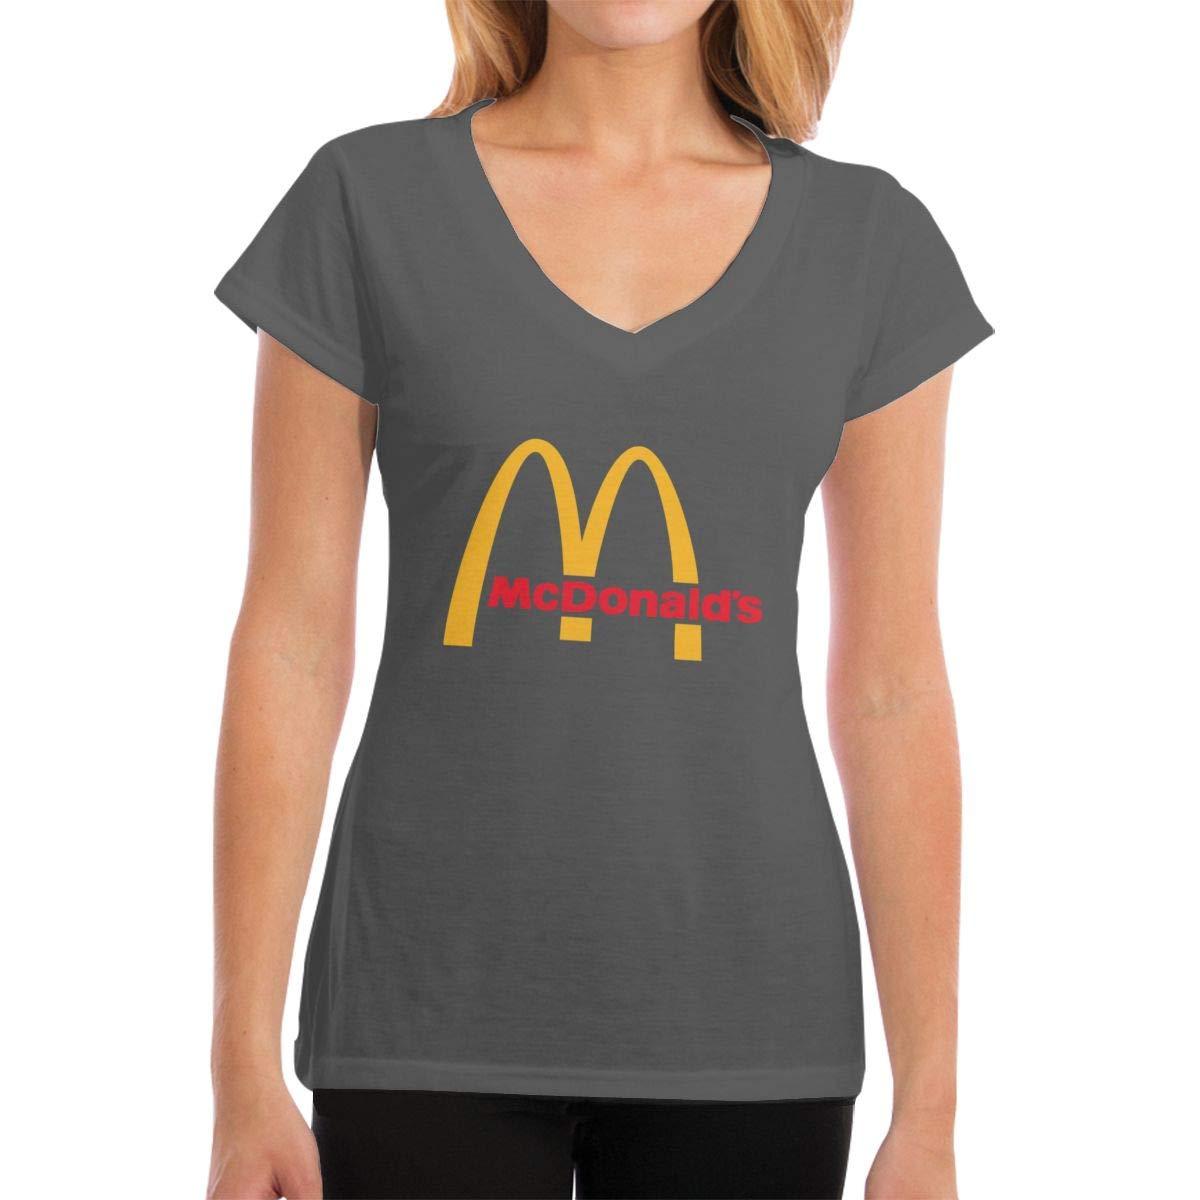 Lakssn Women's Youth Girls McDonalds Tee Shirts Short Sleeve T Shirt for Women Girls T-Shirt Crew Neck Cotton Tshirt Deep Heather XXL by Lakssn